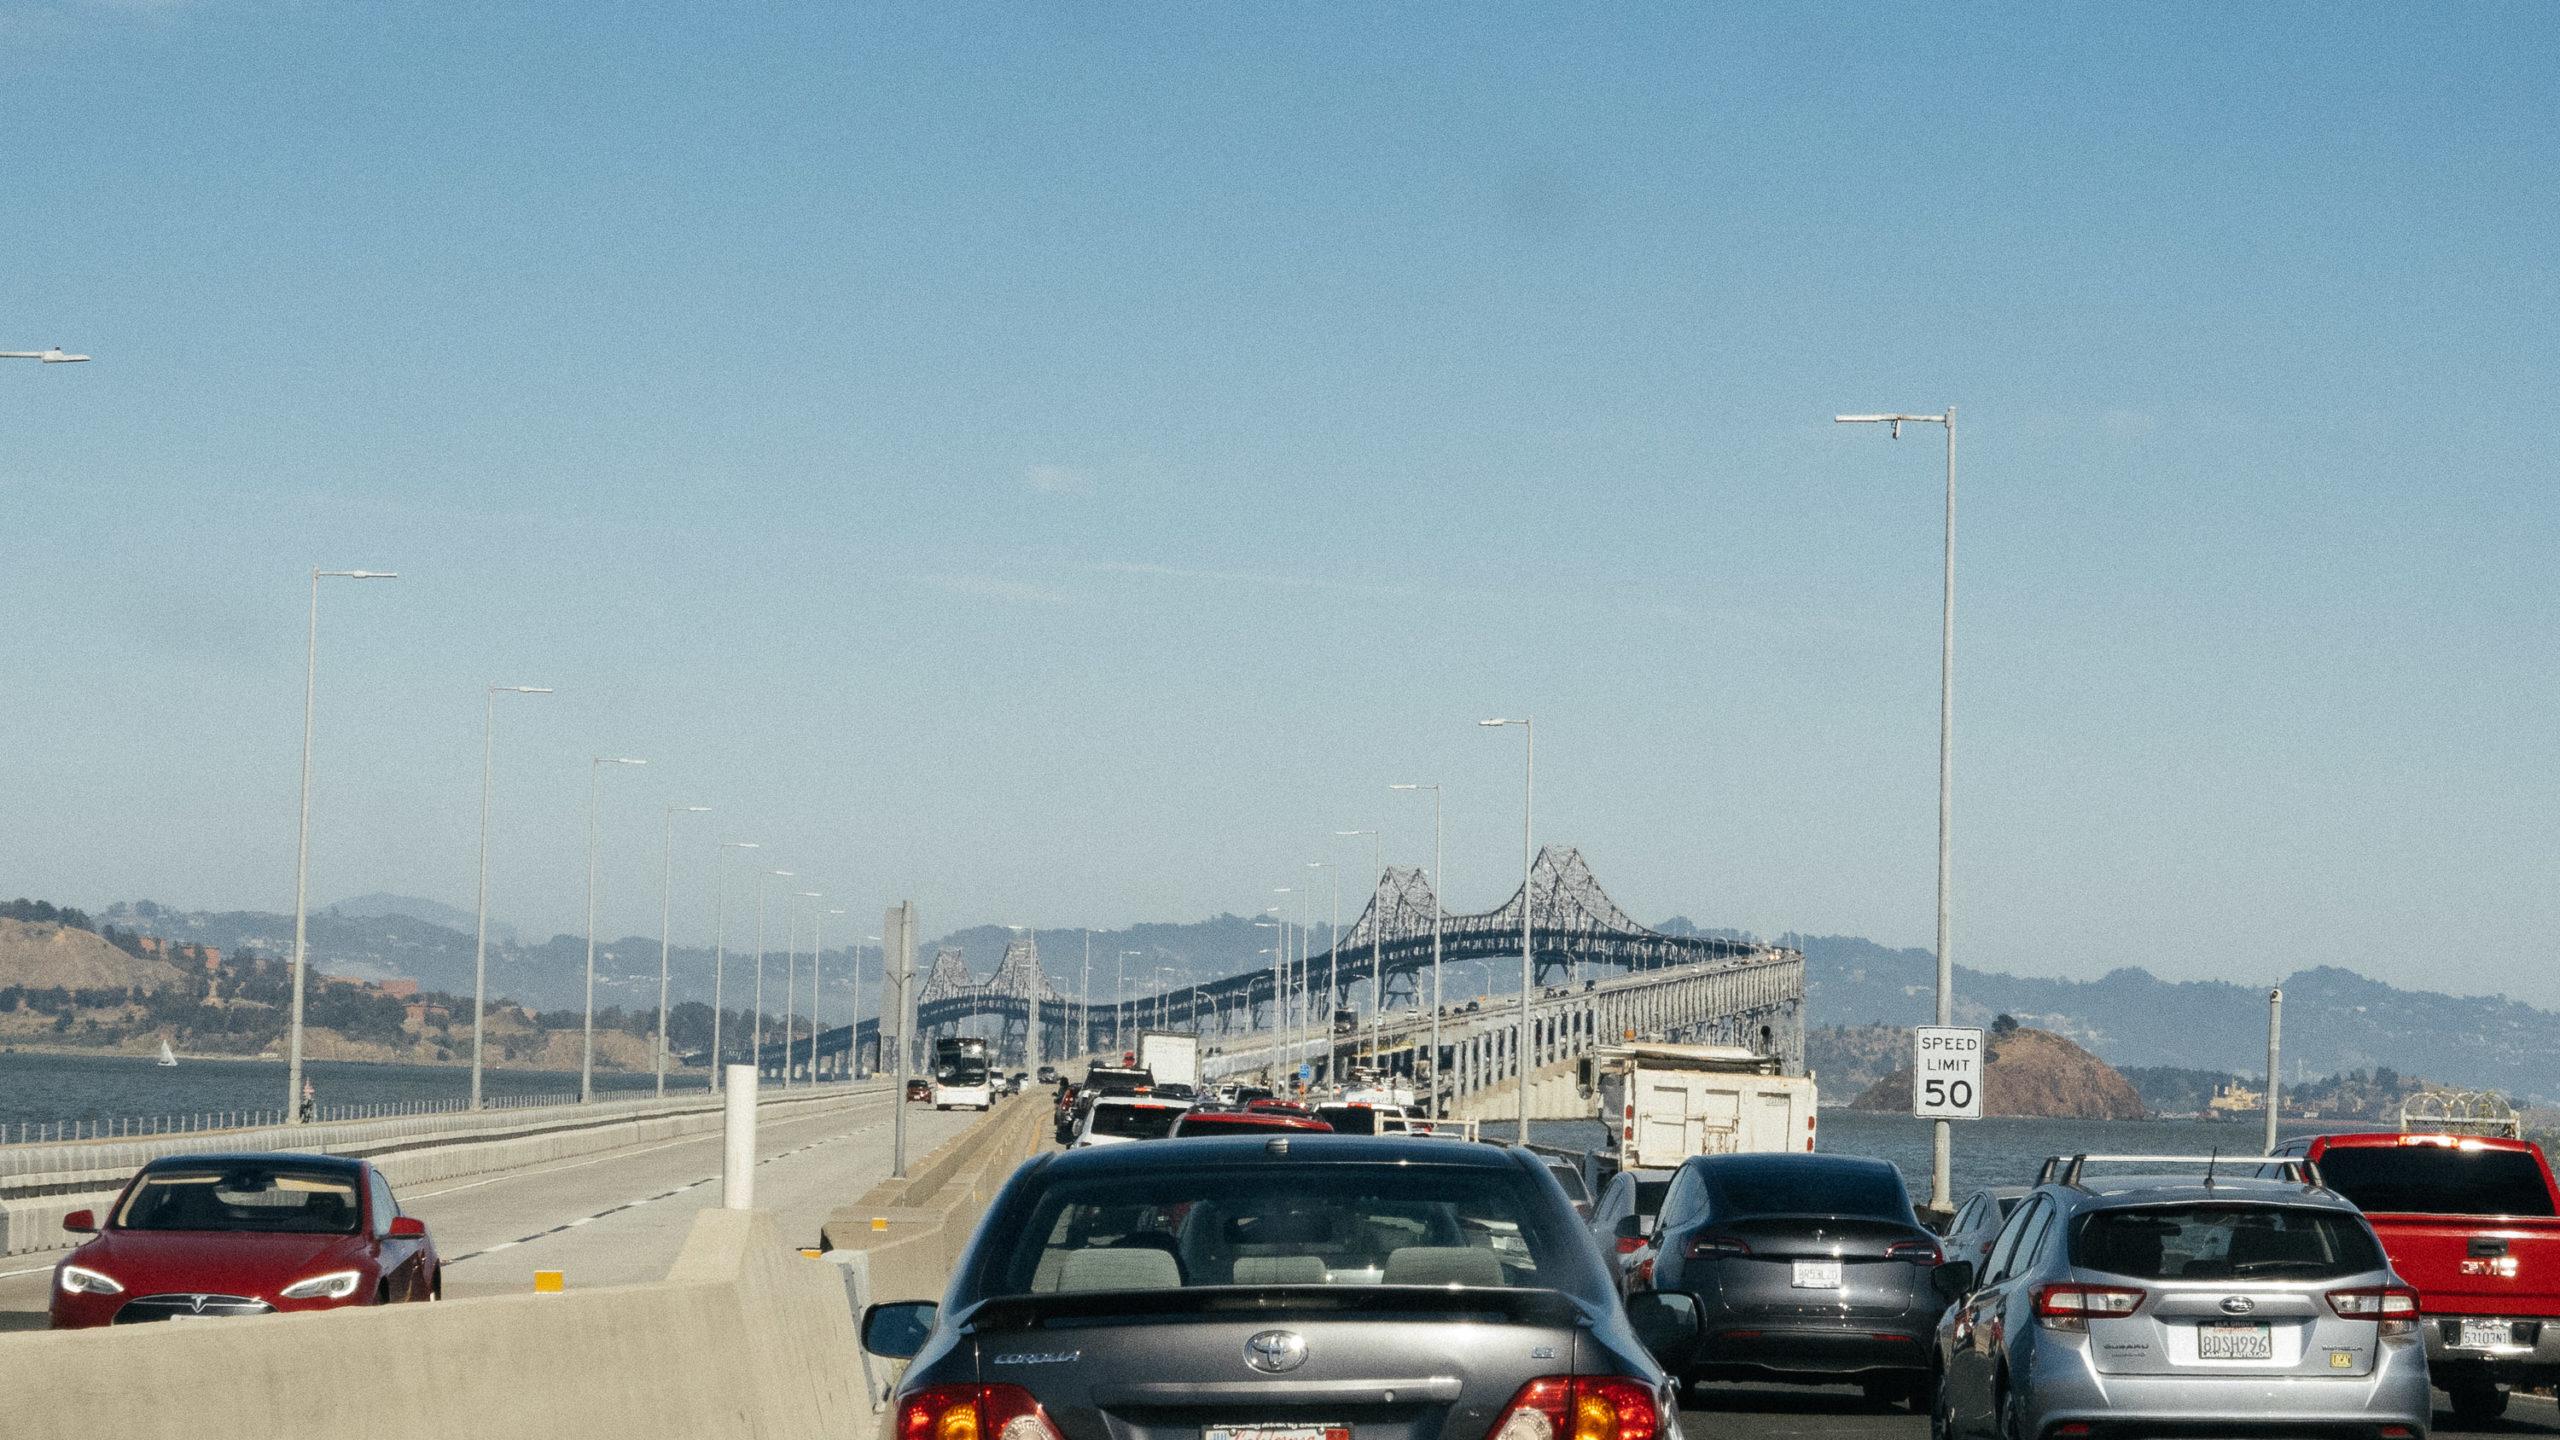 Traffic approaching a multi-level bridge